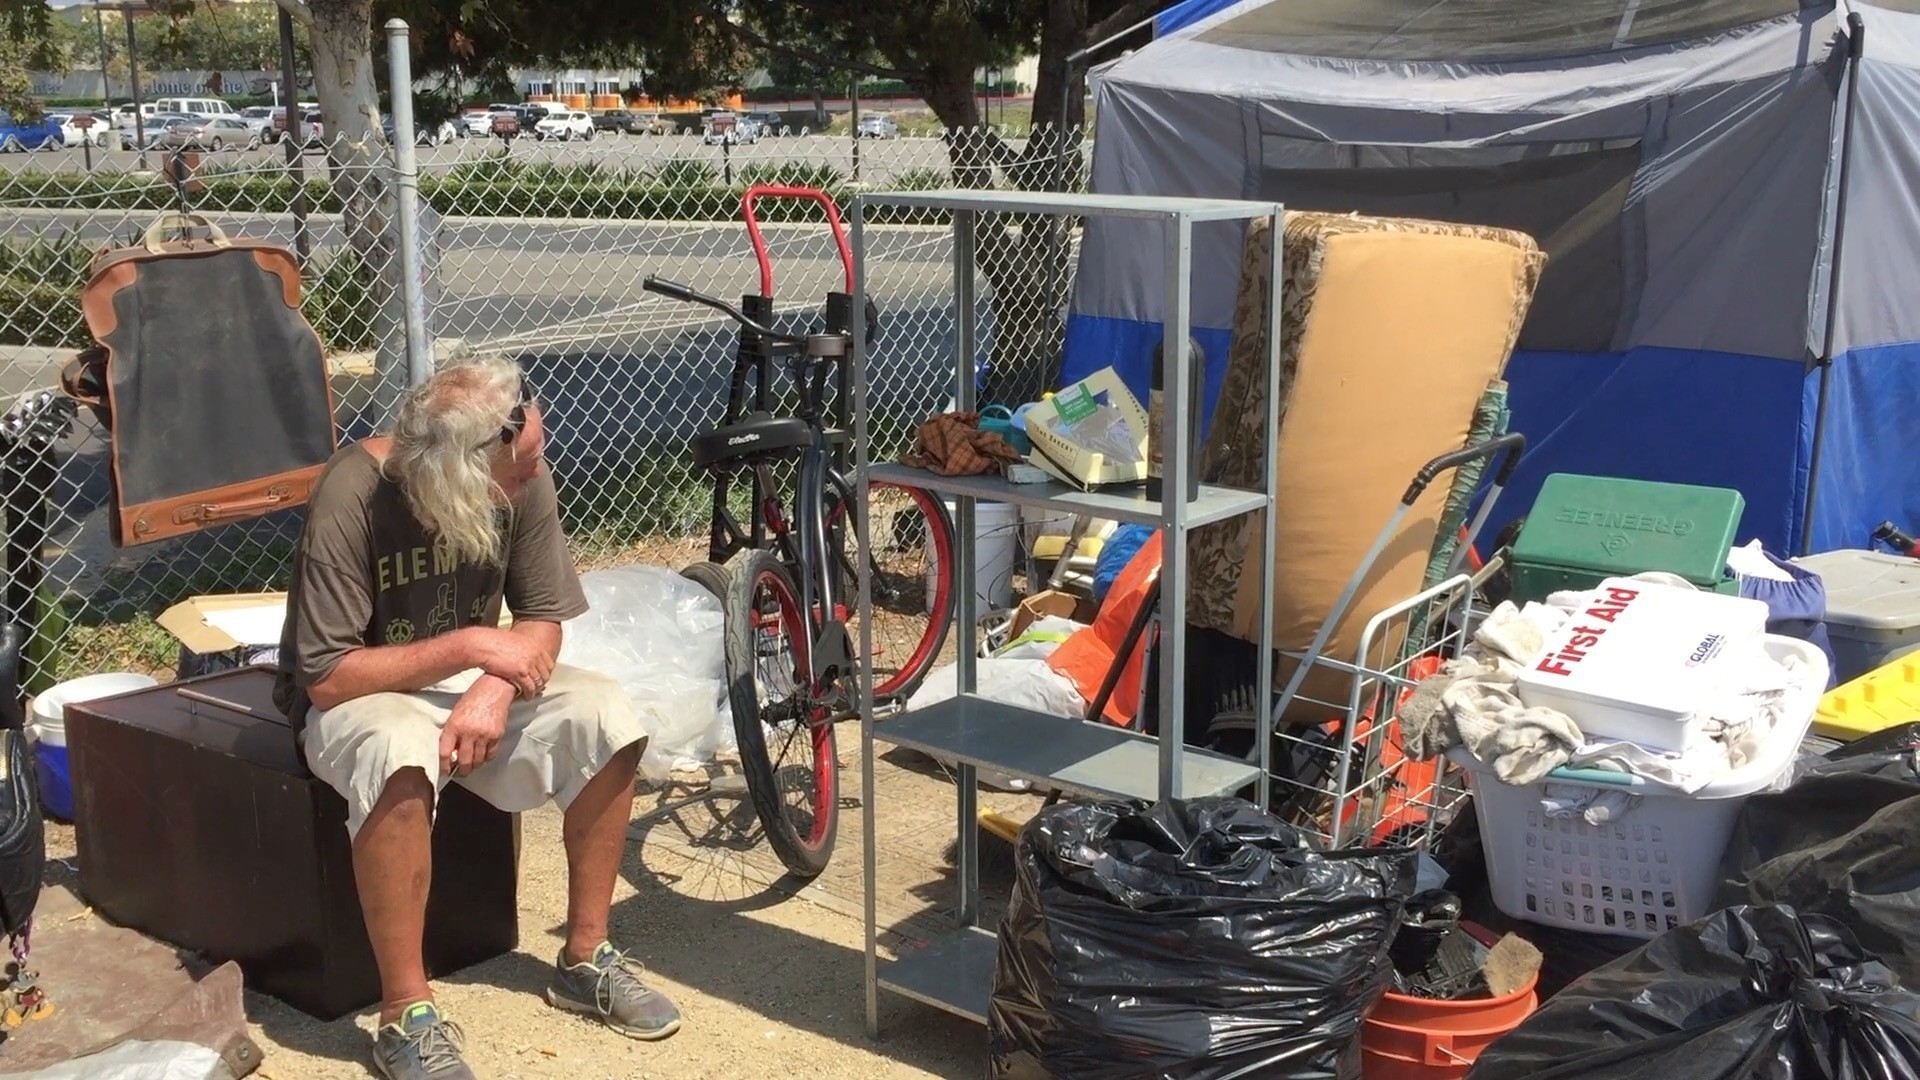 Homeless Encampment Near Santa Ana River Is Moved Los